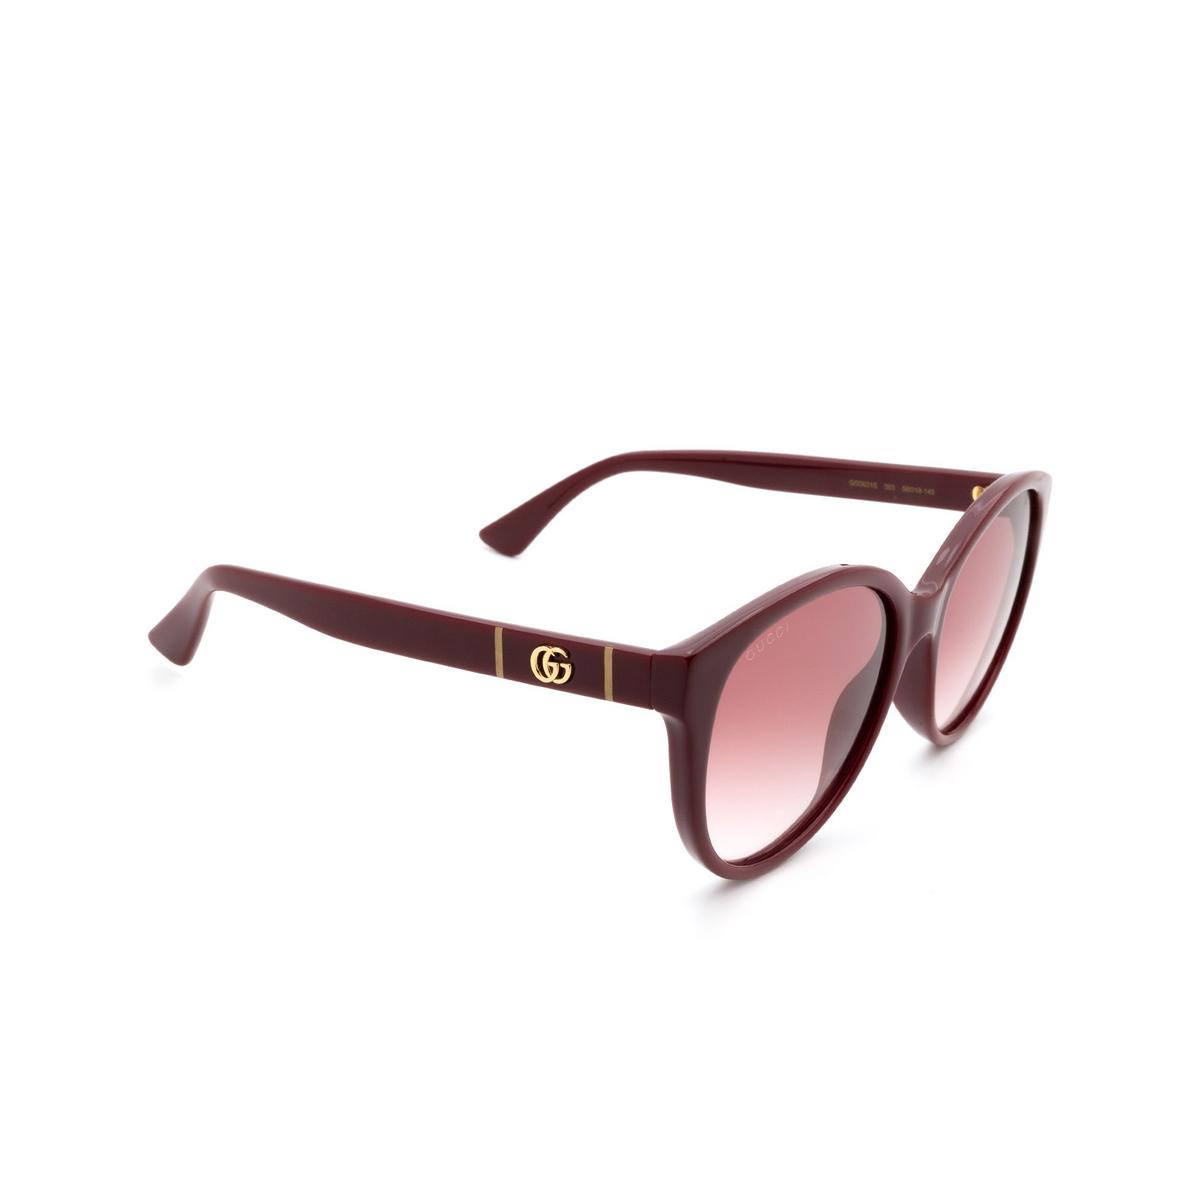 Gucci® Round Sunglasses: GG0631S color Burgundy 003 - 2/3.